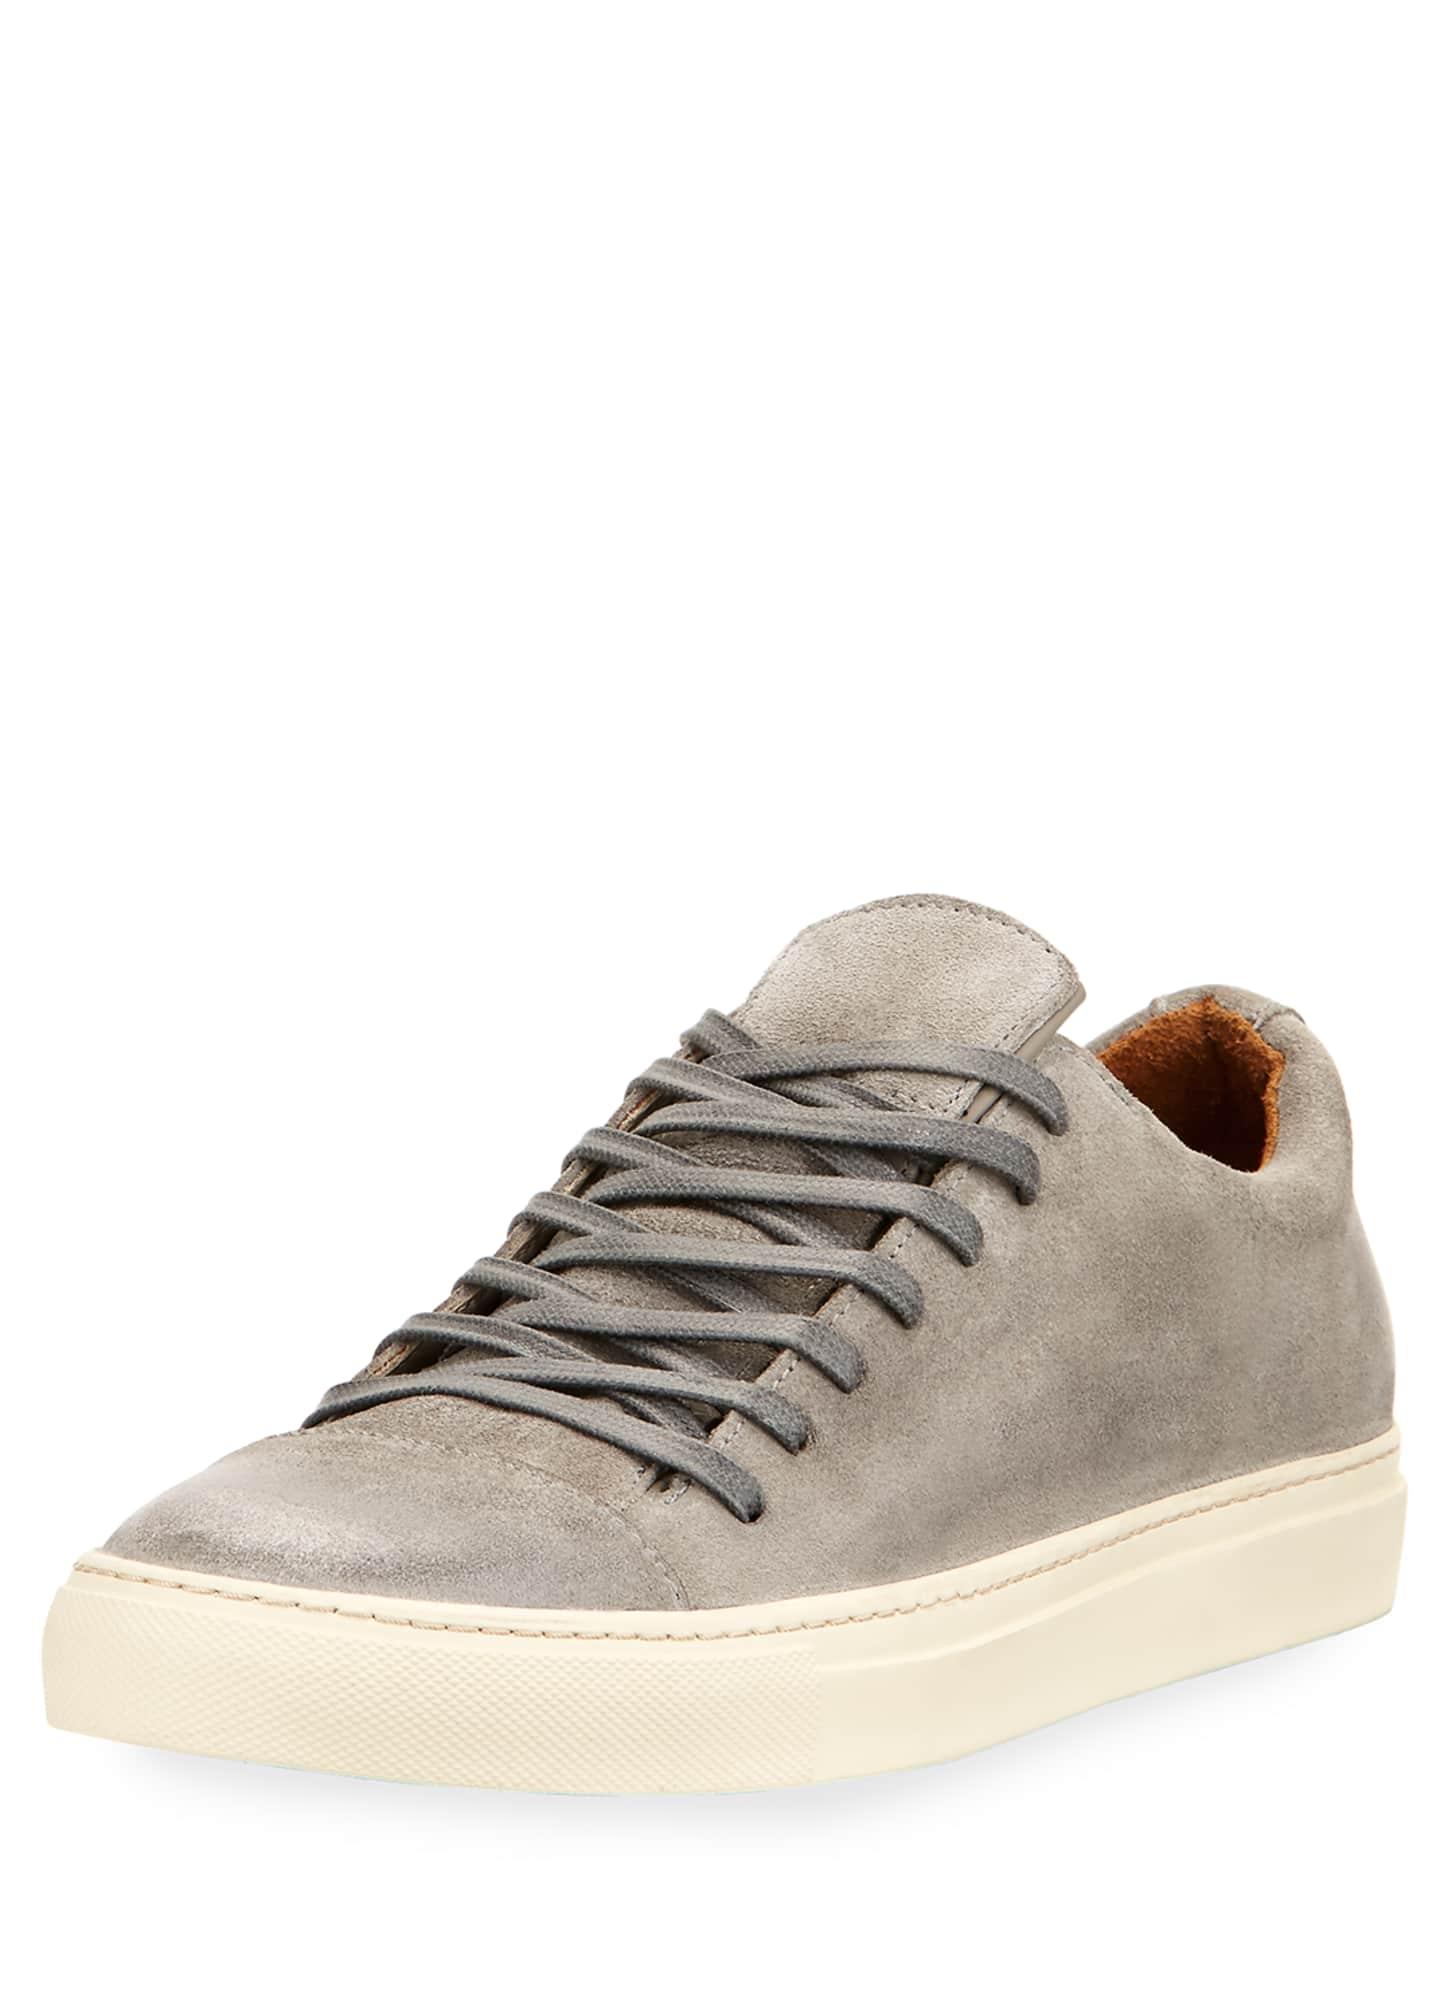 John Varvatos Men's 315 Reed Suede Low-Top Sneakers,